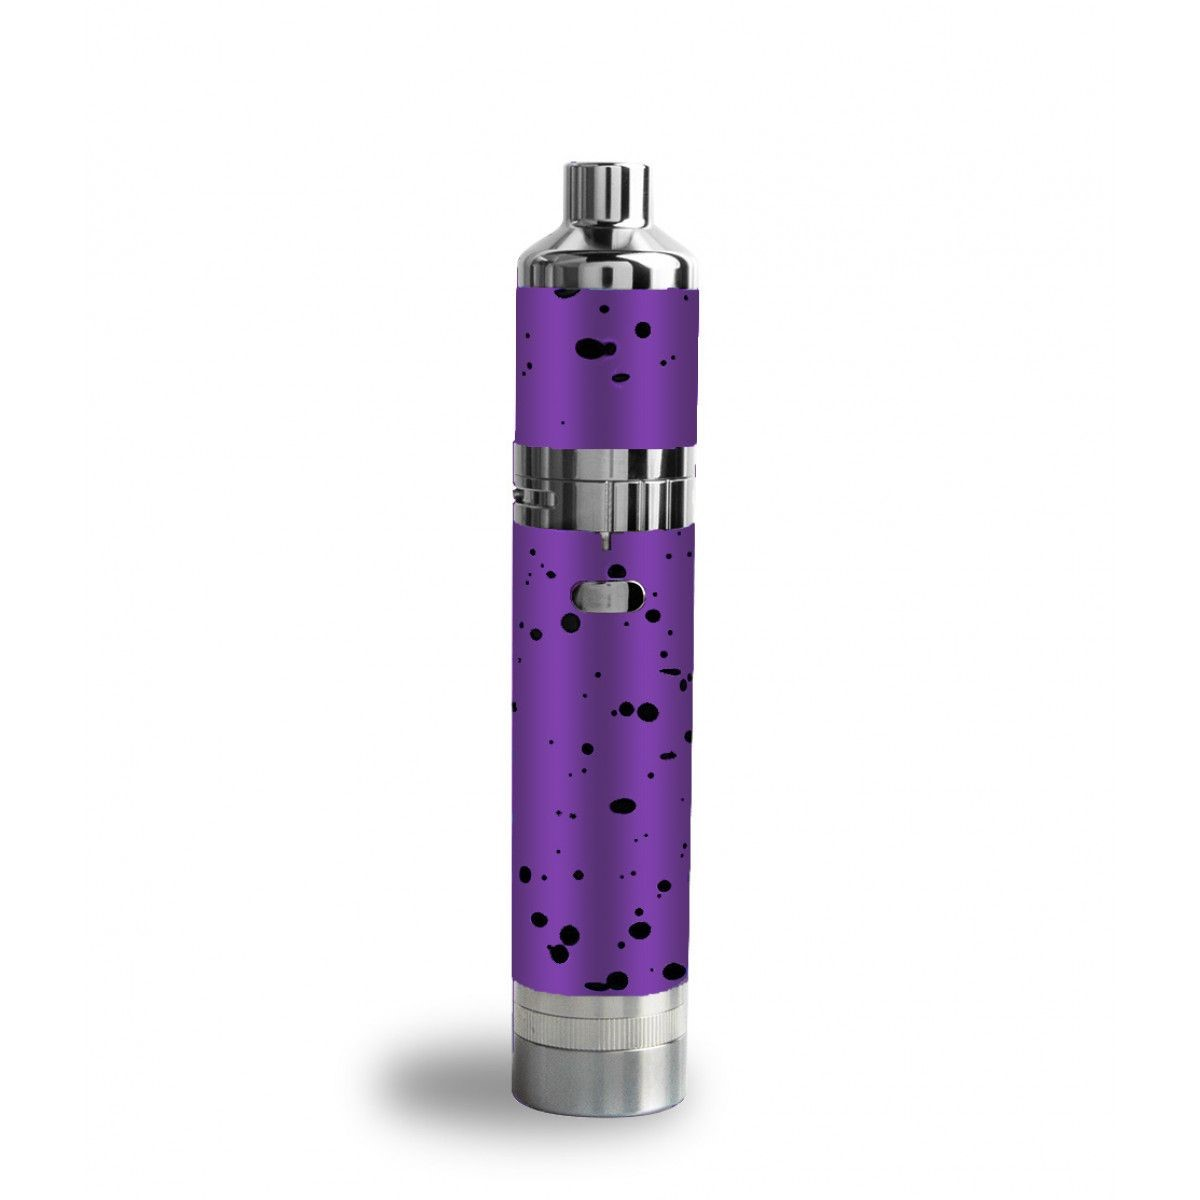 Authentic purple and black vaporizer